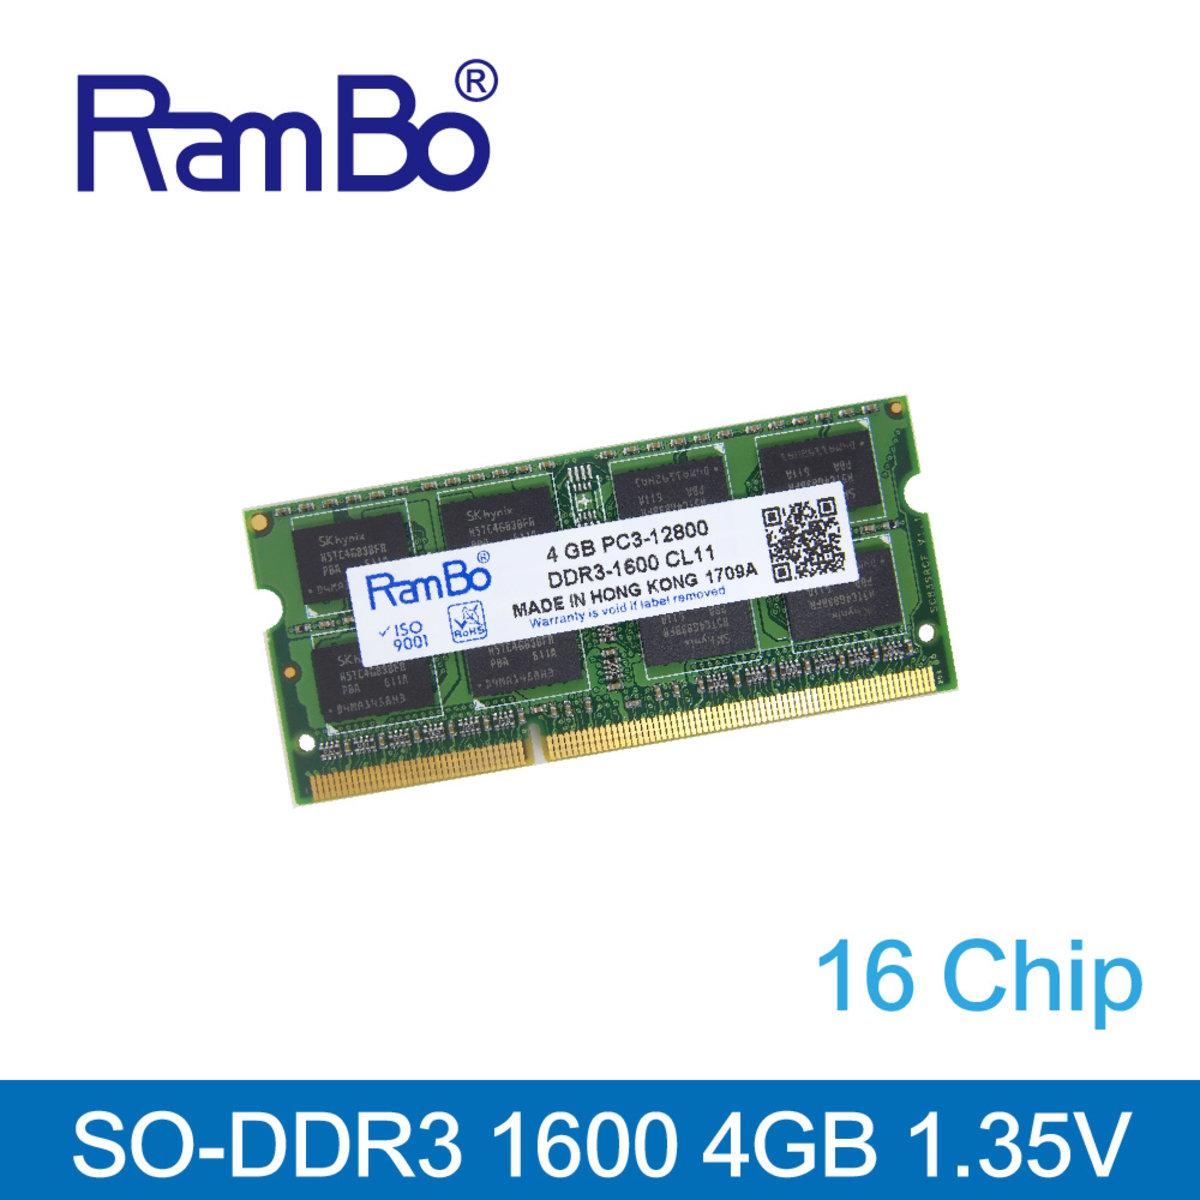 4GB DDR3 1600MHz SO DIMM 16-Chip(雙面) 1.35V 記憶體 內存條 筆記本電腦適用 Notebook